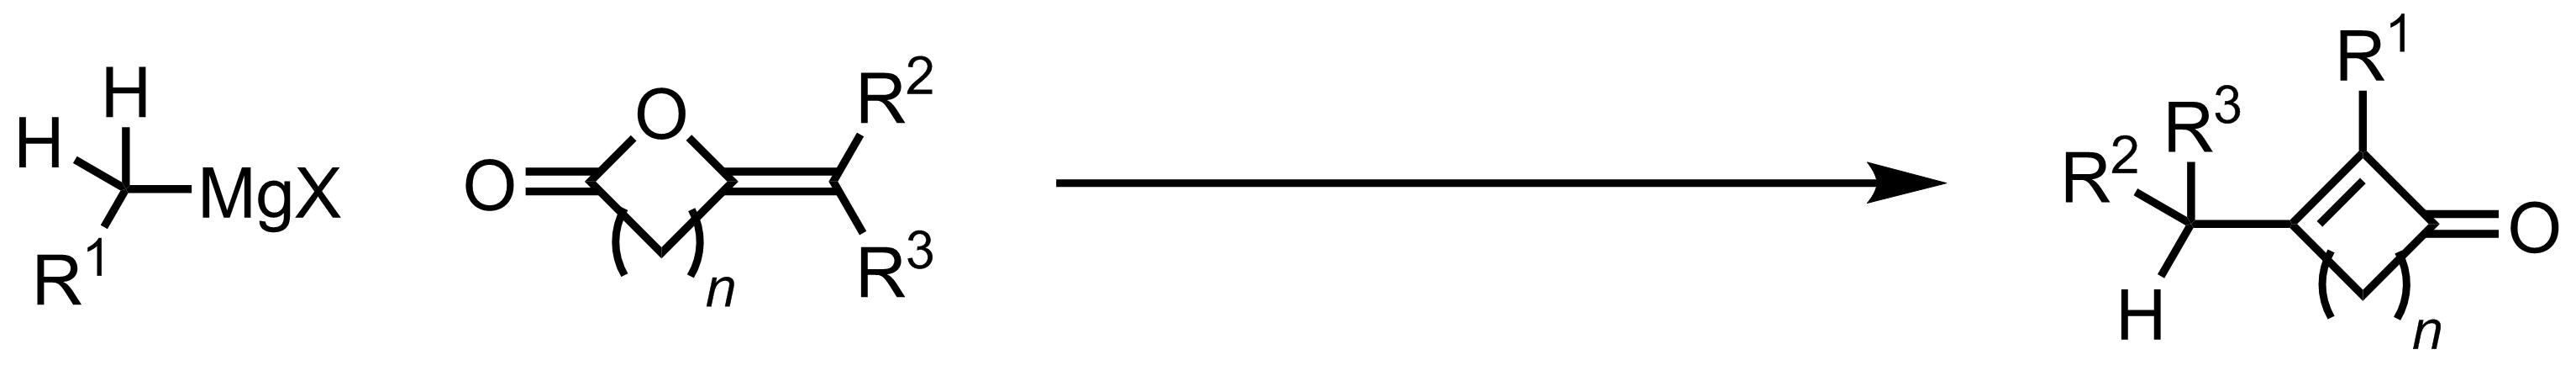 Schematic representation of the Fujimoto-Belleau Reaction.